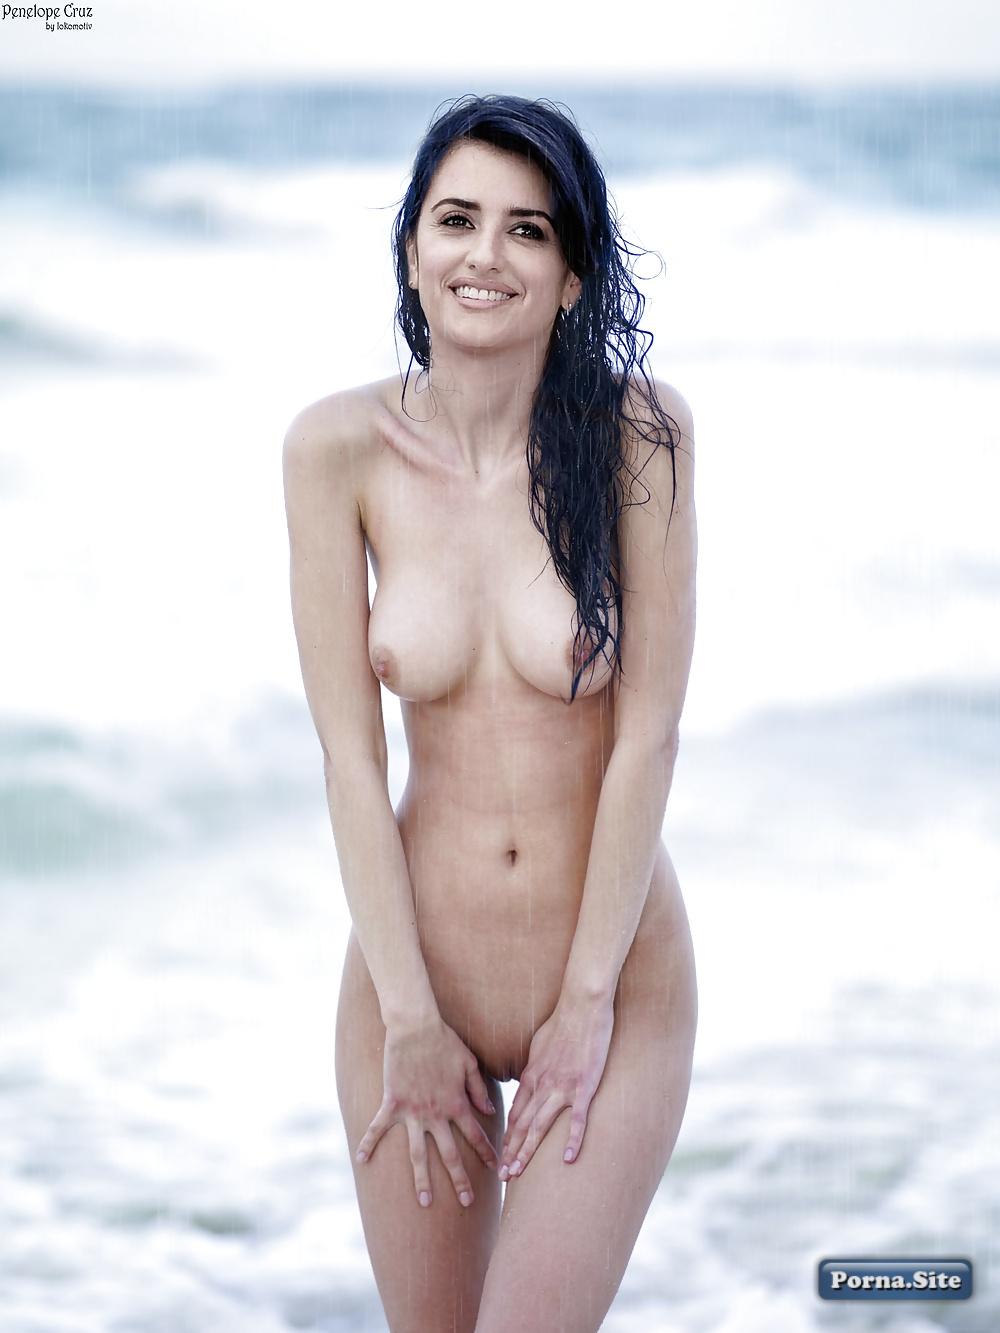 Penelope Cruz 26